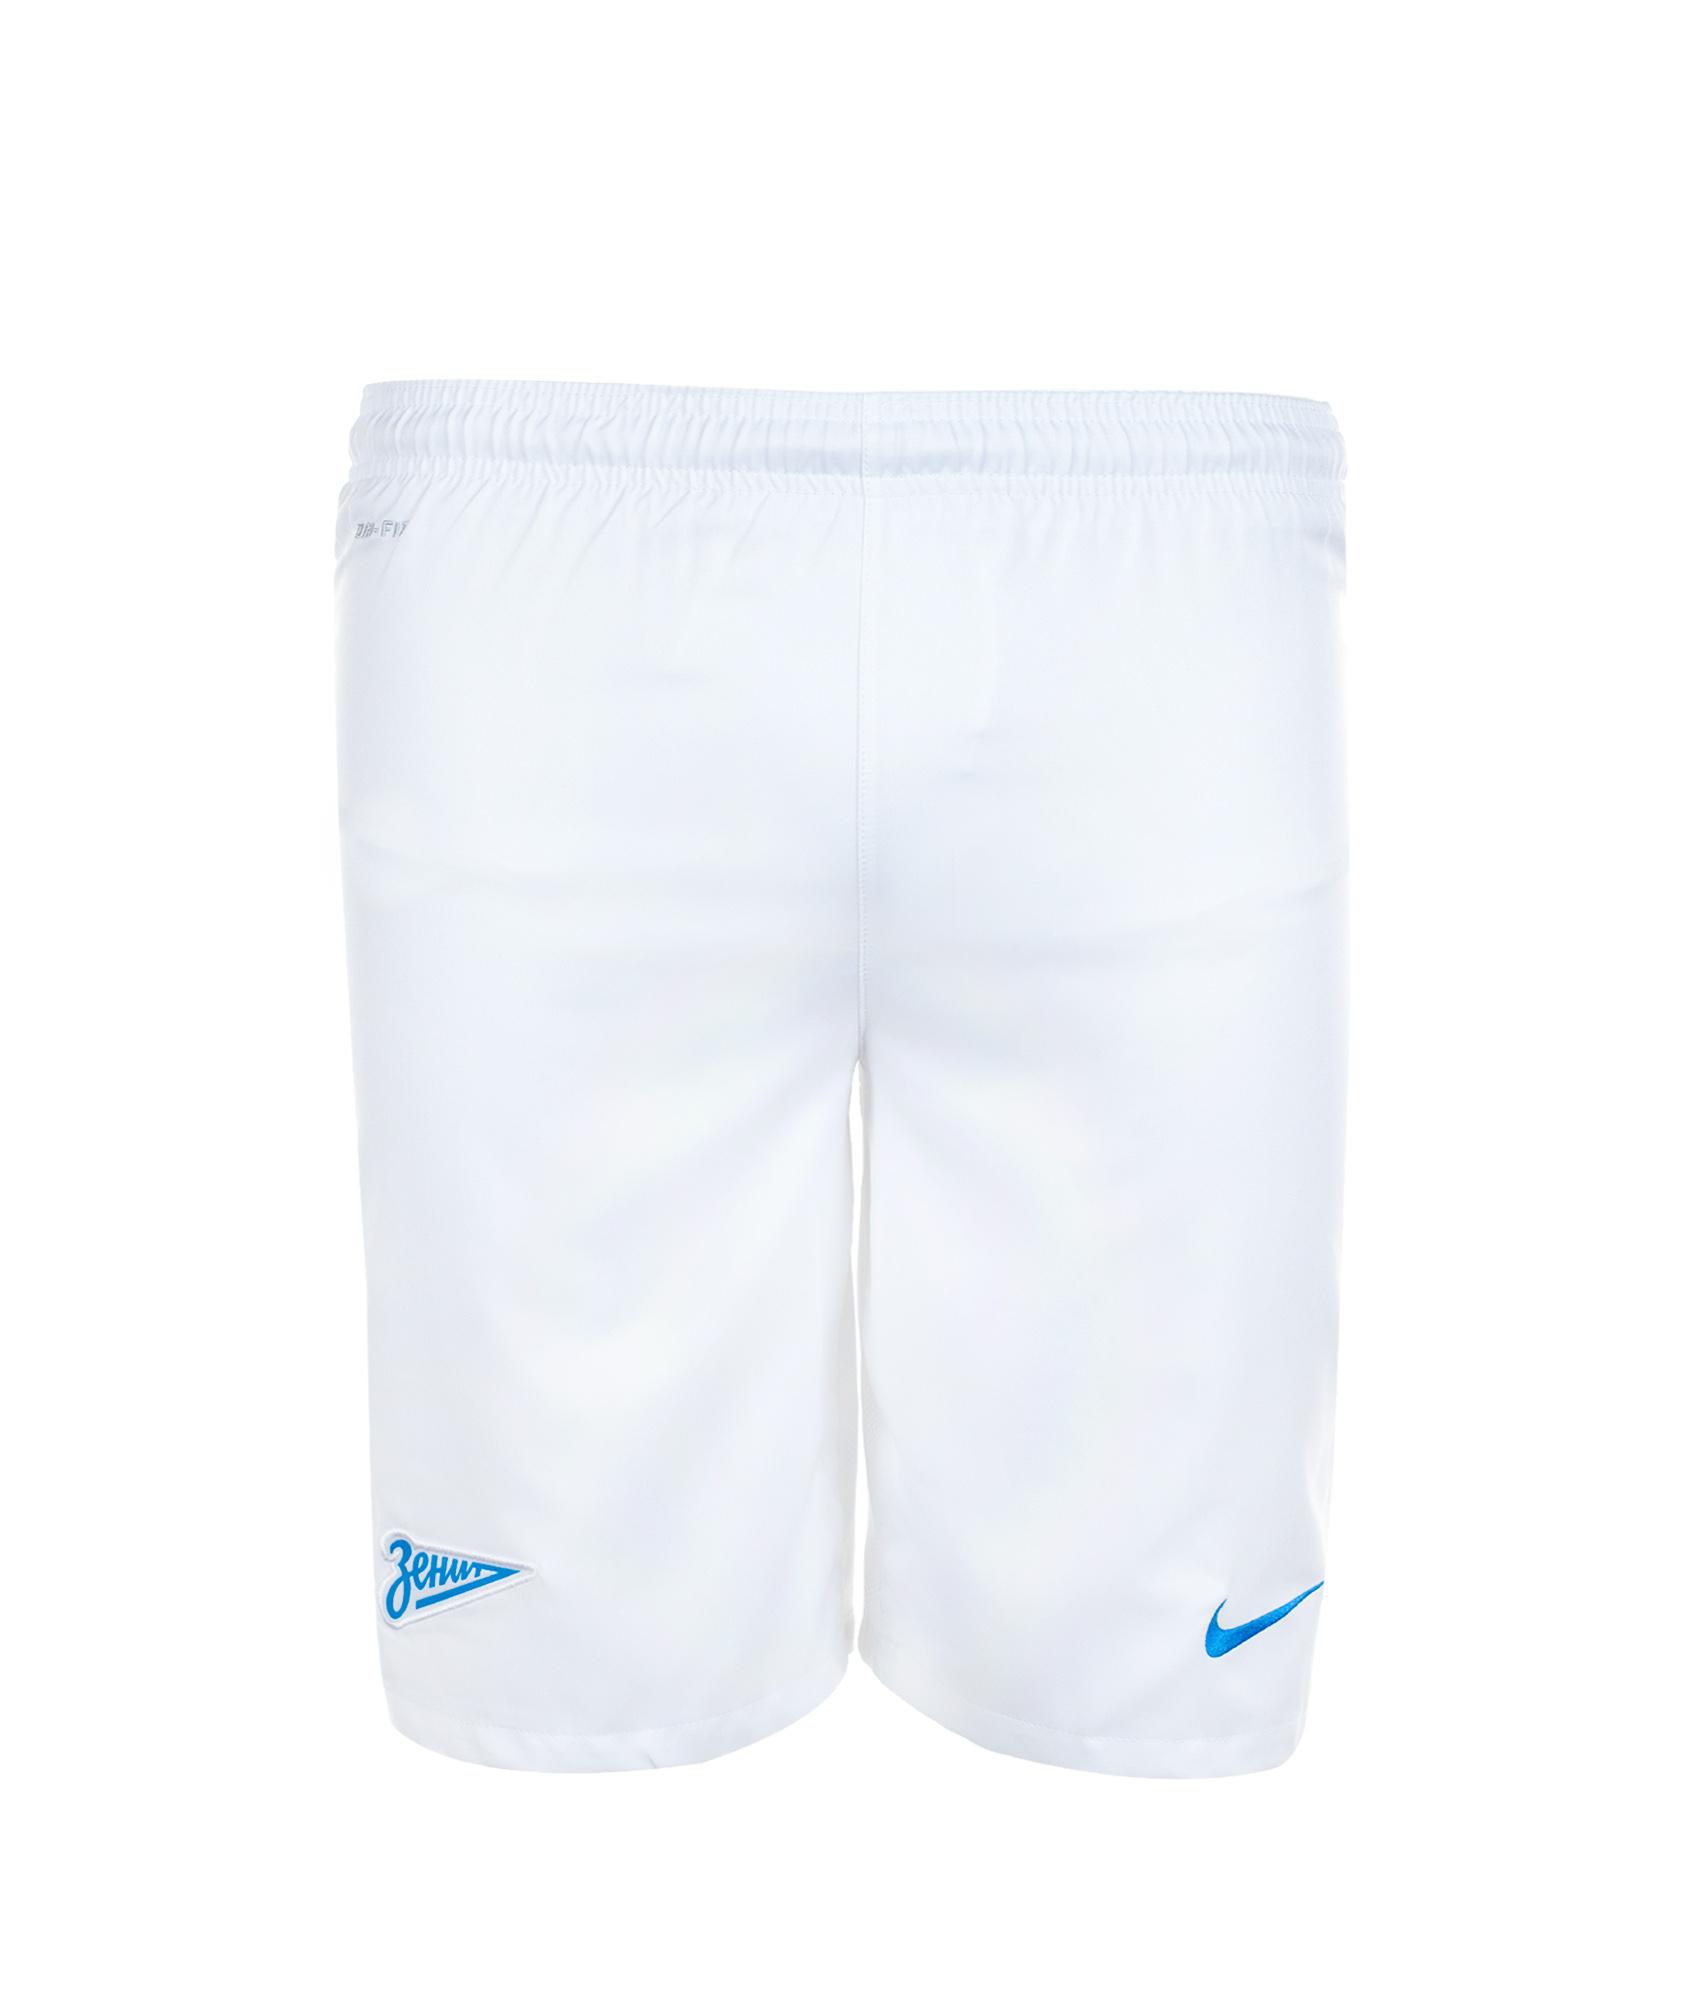 Шорты белые, Цвет-Белый, Размер-XL